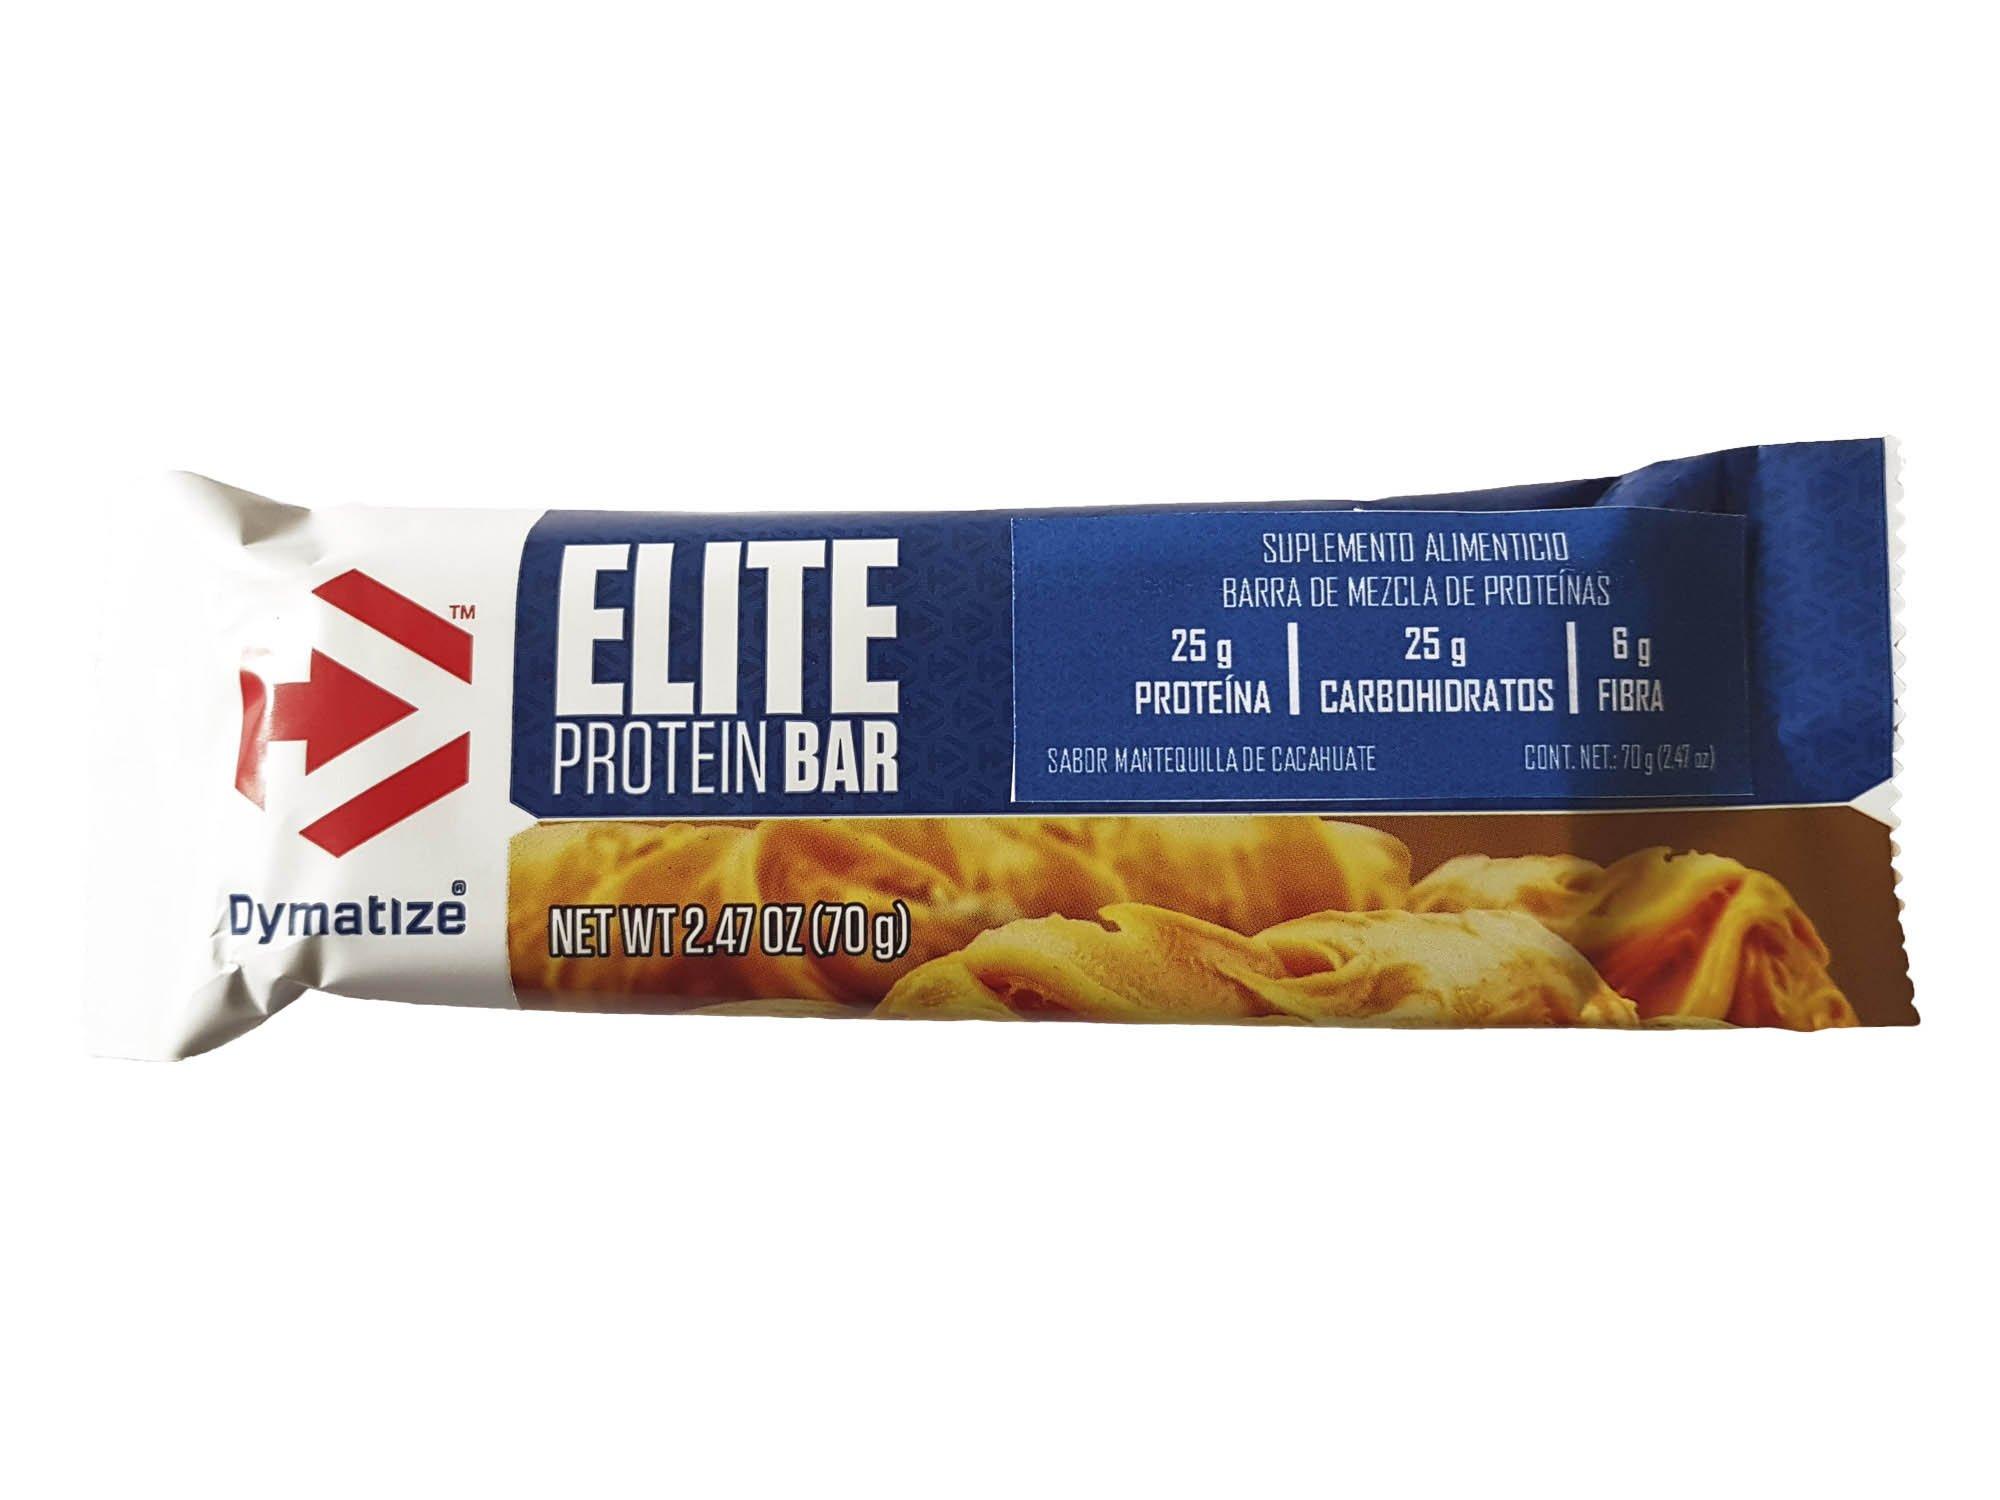 Dymatize Elite Protein Bar, Peanut Butter, 29.6 Ounce